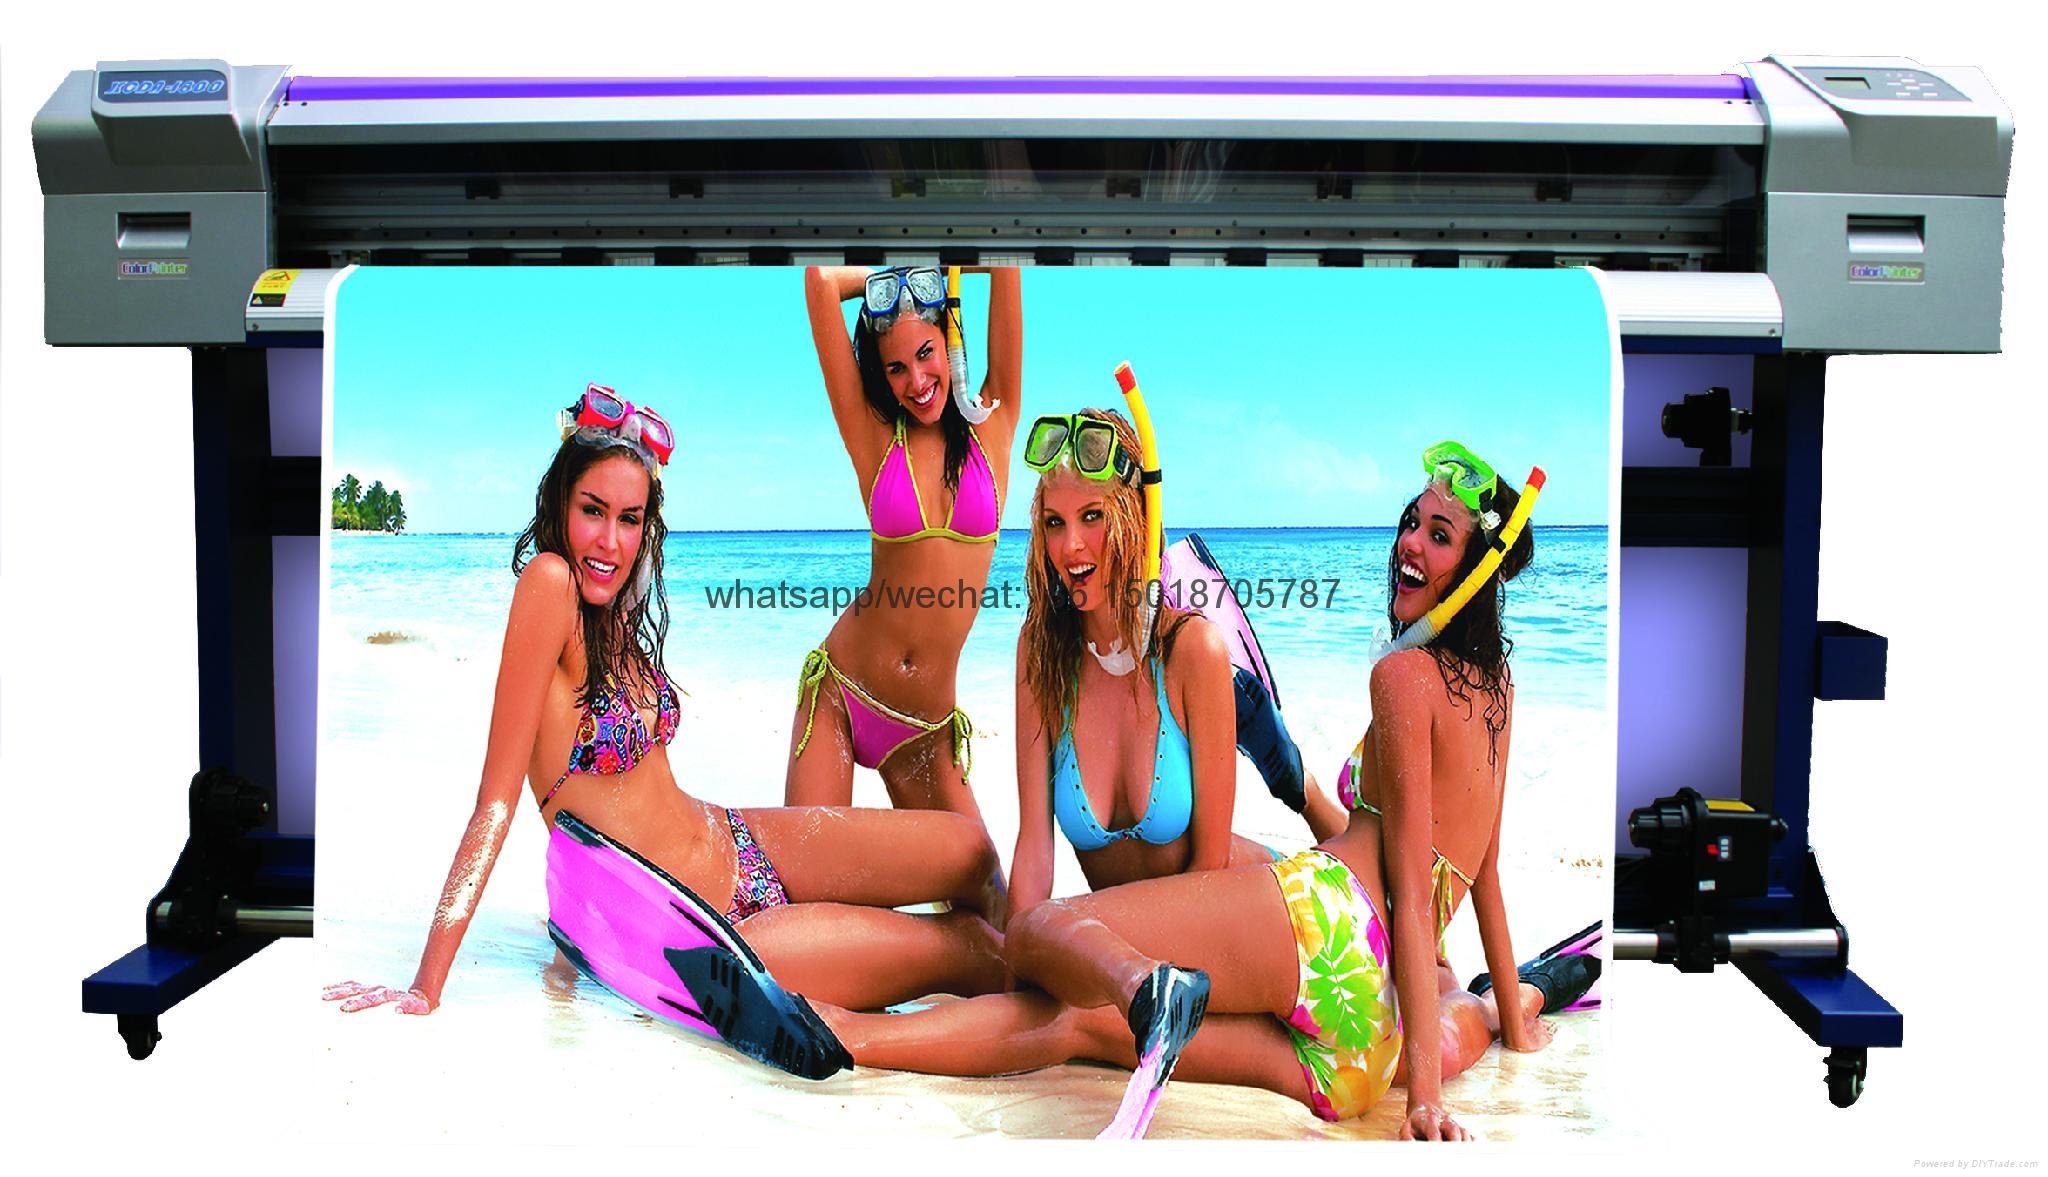 sublimation textile printer with epson 5113 printhead 1440dpi 10